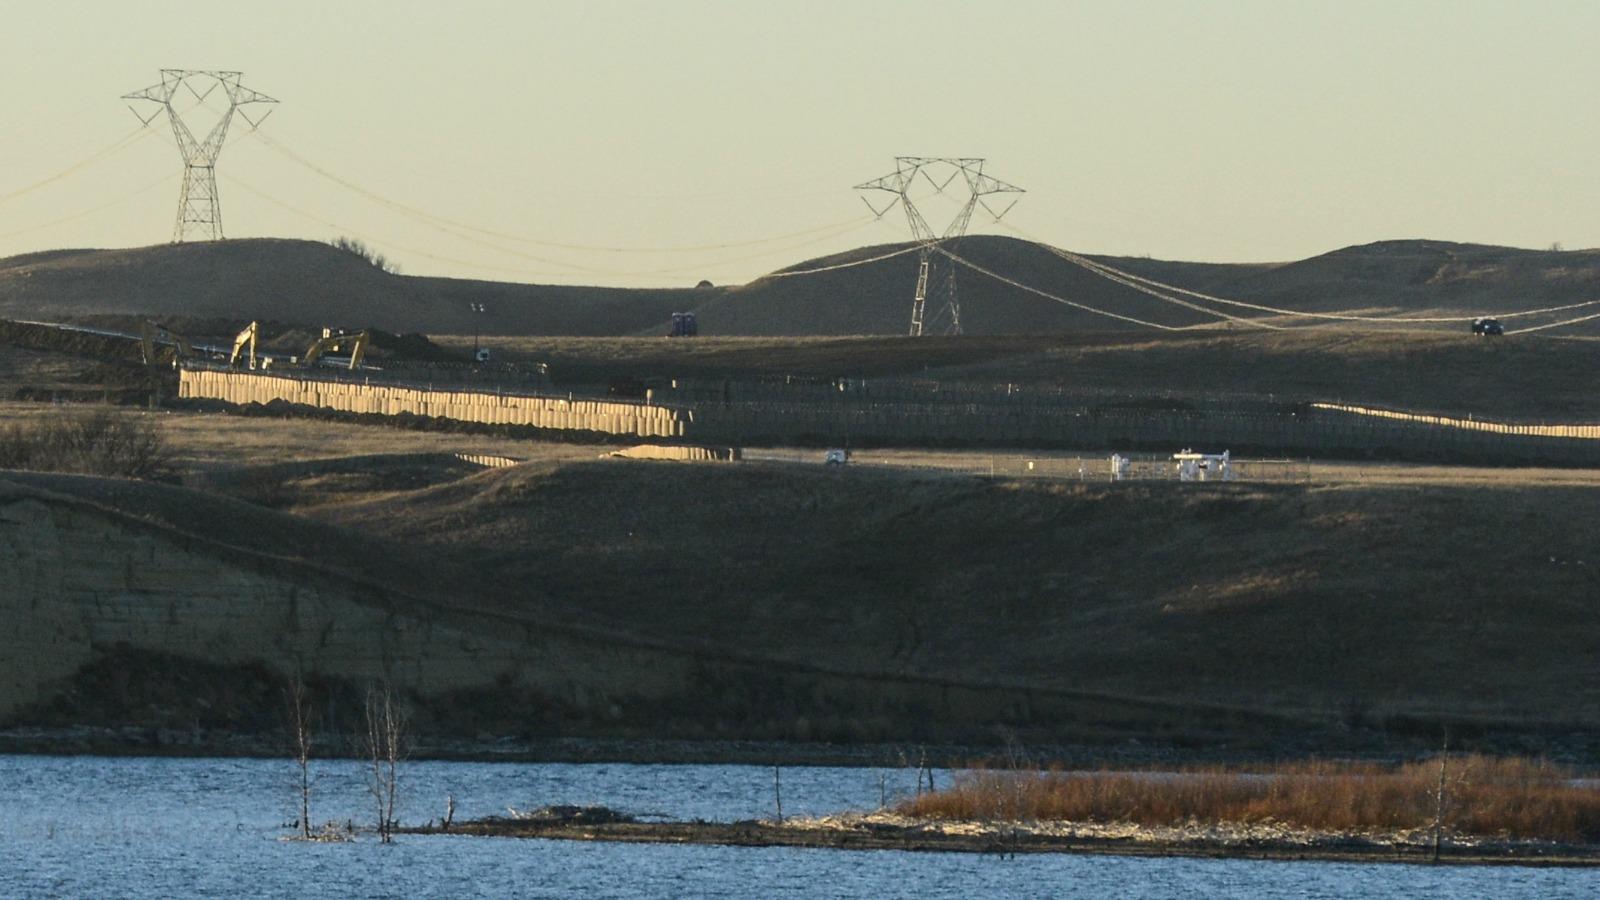 Dakota Access Pipeline equipment is seen at Lake Oahe near Standing Rock.